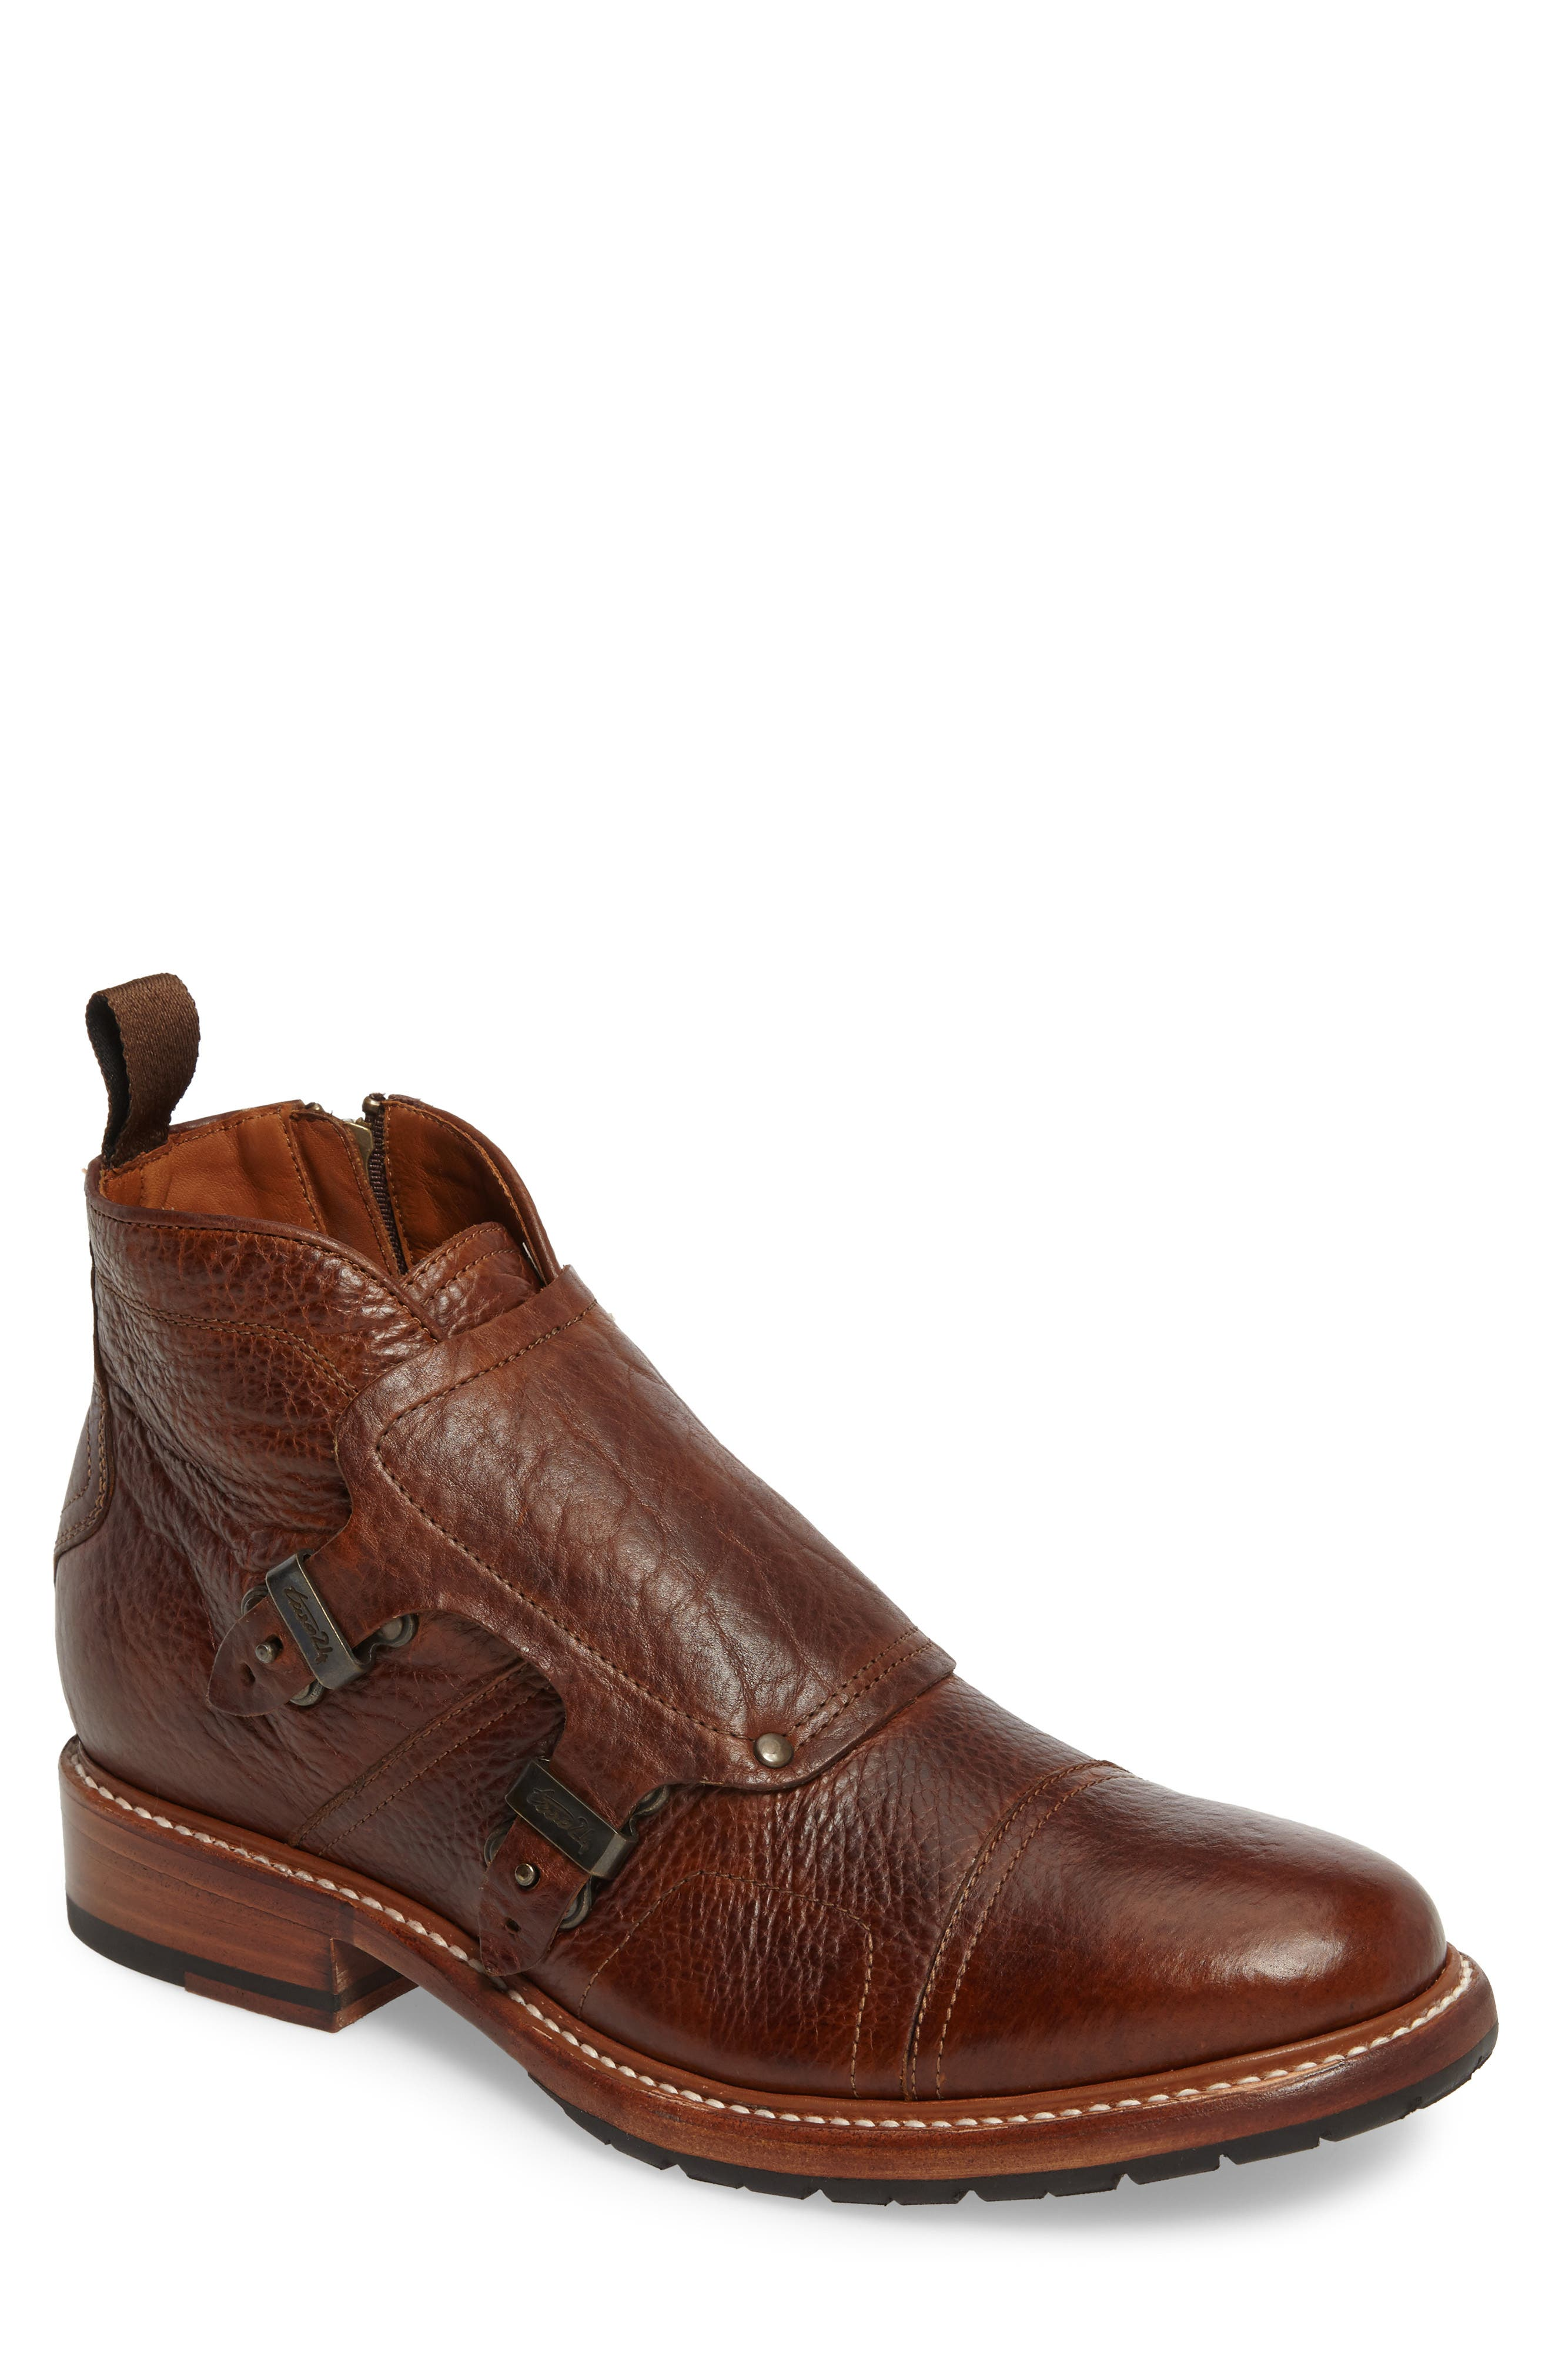 Montclair Zip Boot,                             Main thumbnail 1, color,                             Brown Leather